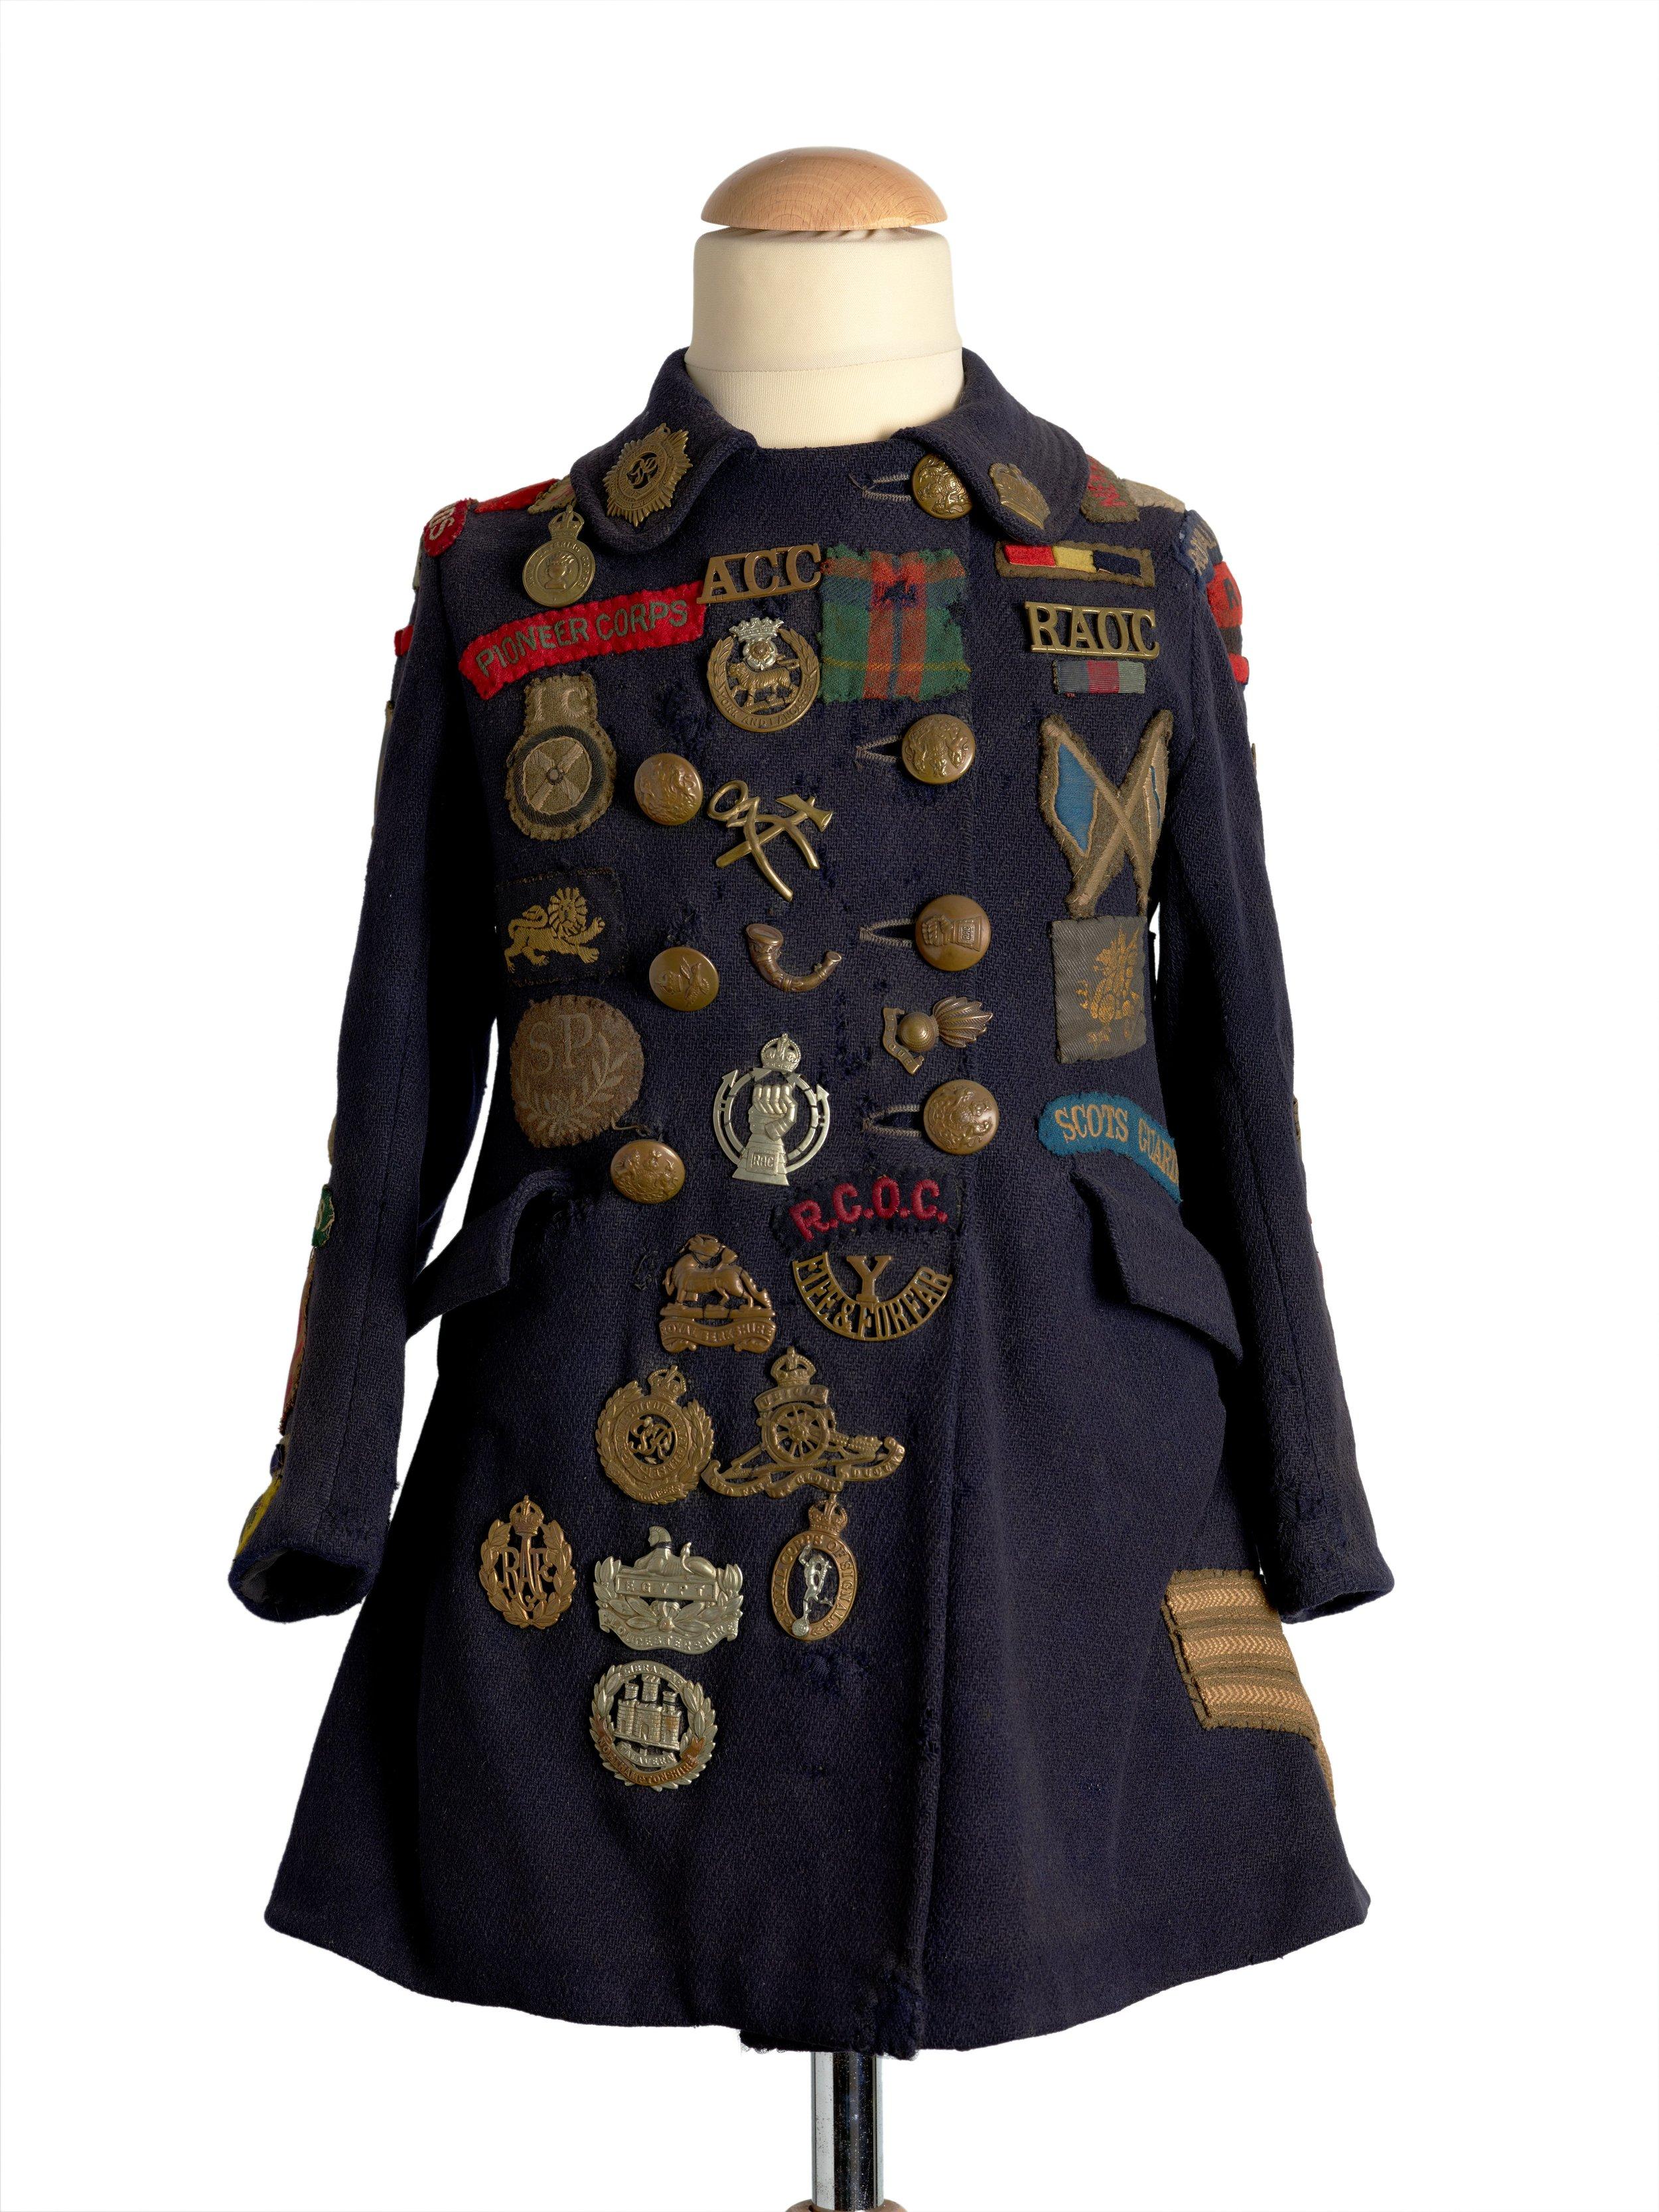 Betty Whites coat